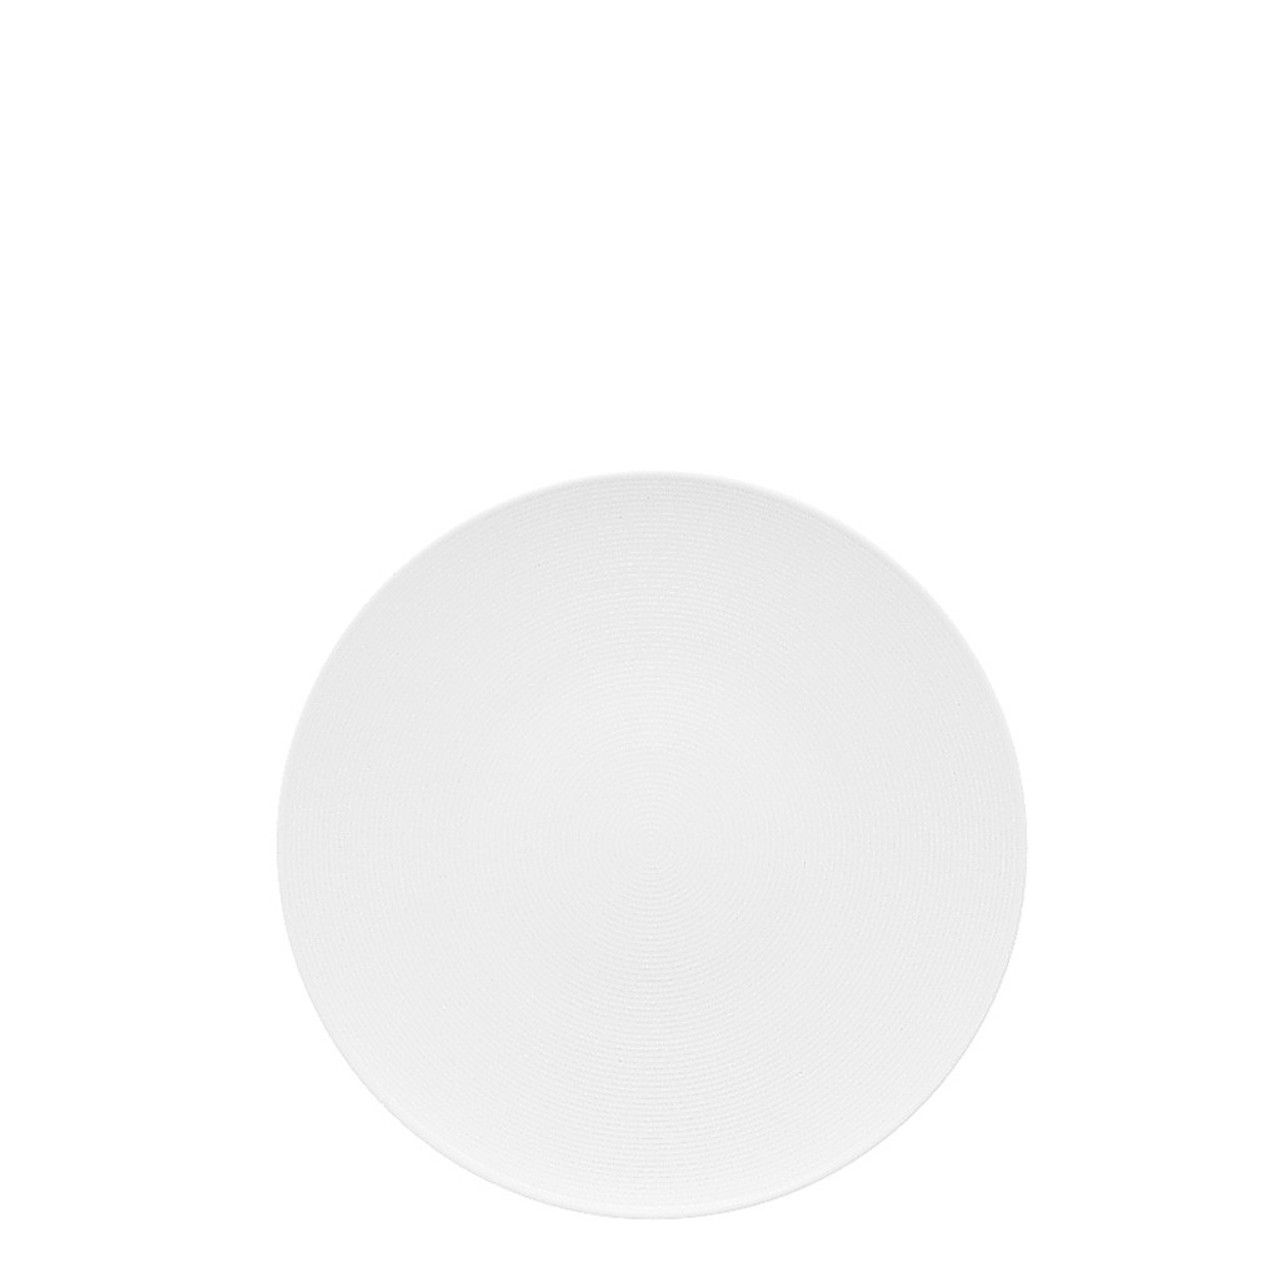 Salad Plate, 8 1/2 inch | Loft White